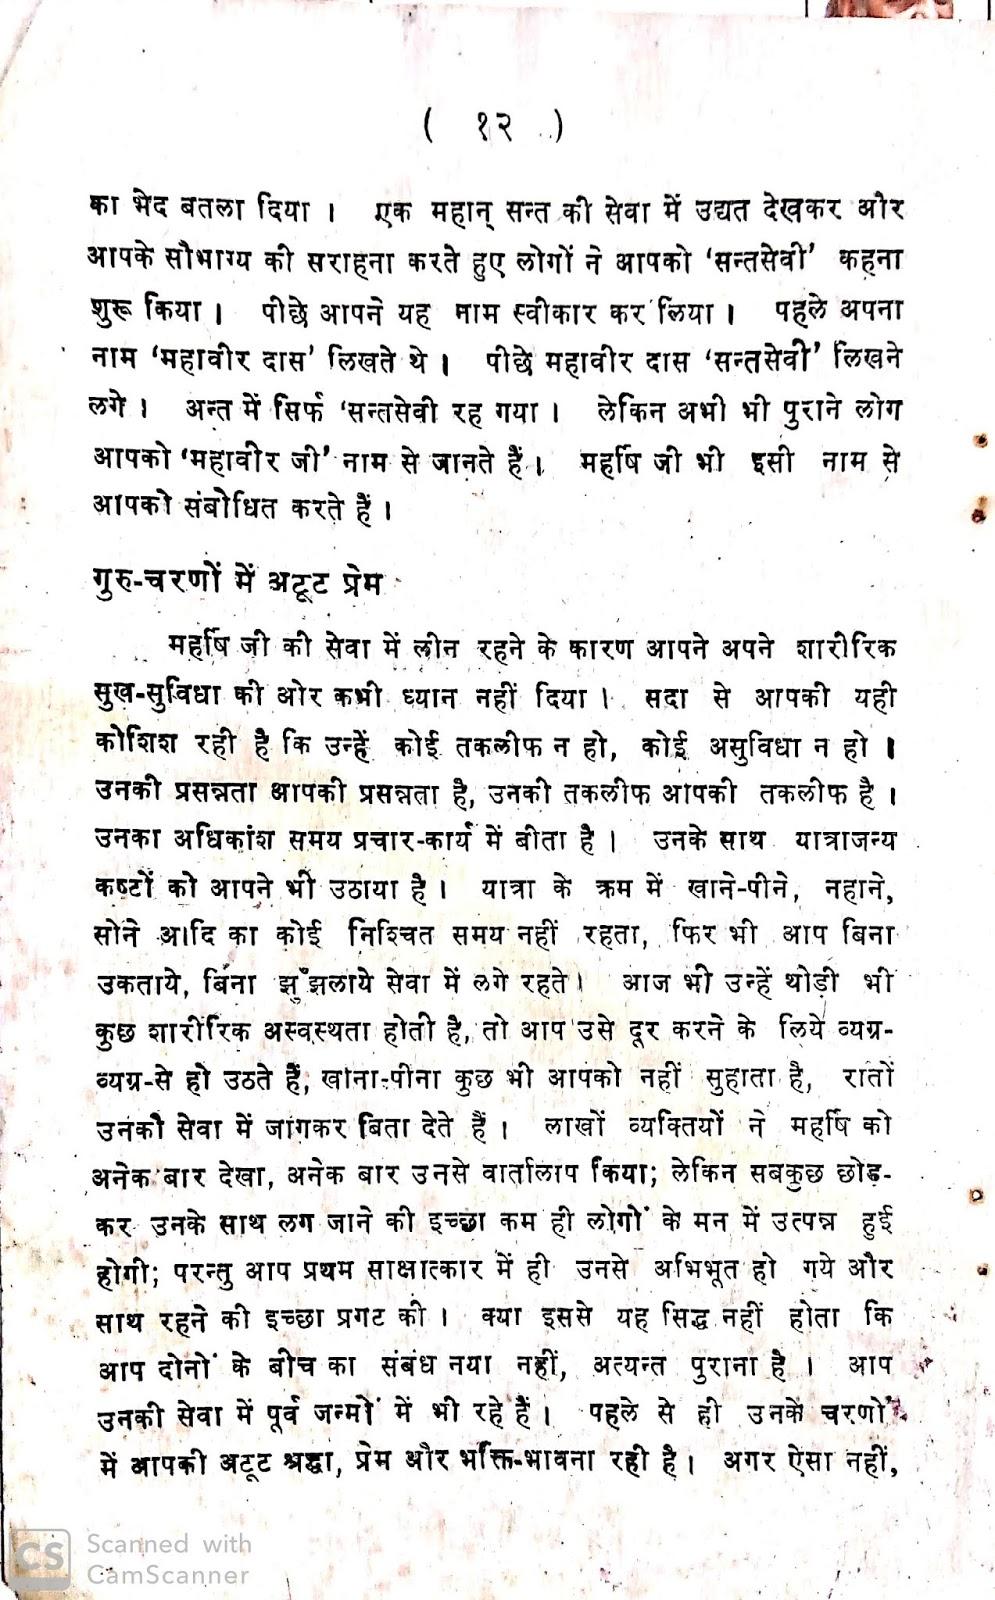 3 पूज्य पाद संतसेवी जी महाराज का परिचय। Brief introduction of Pujya Pad Santsevi Ji Maharaj संतसेवी परिचय चित्र 12